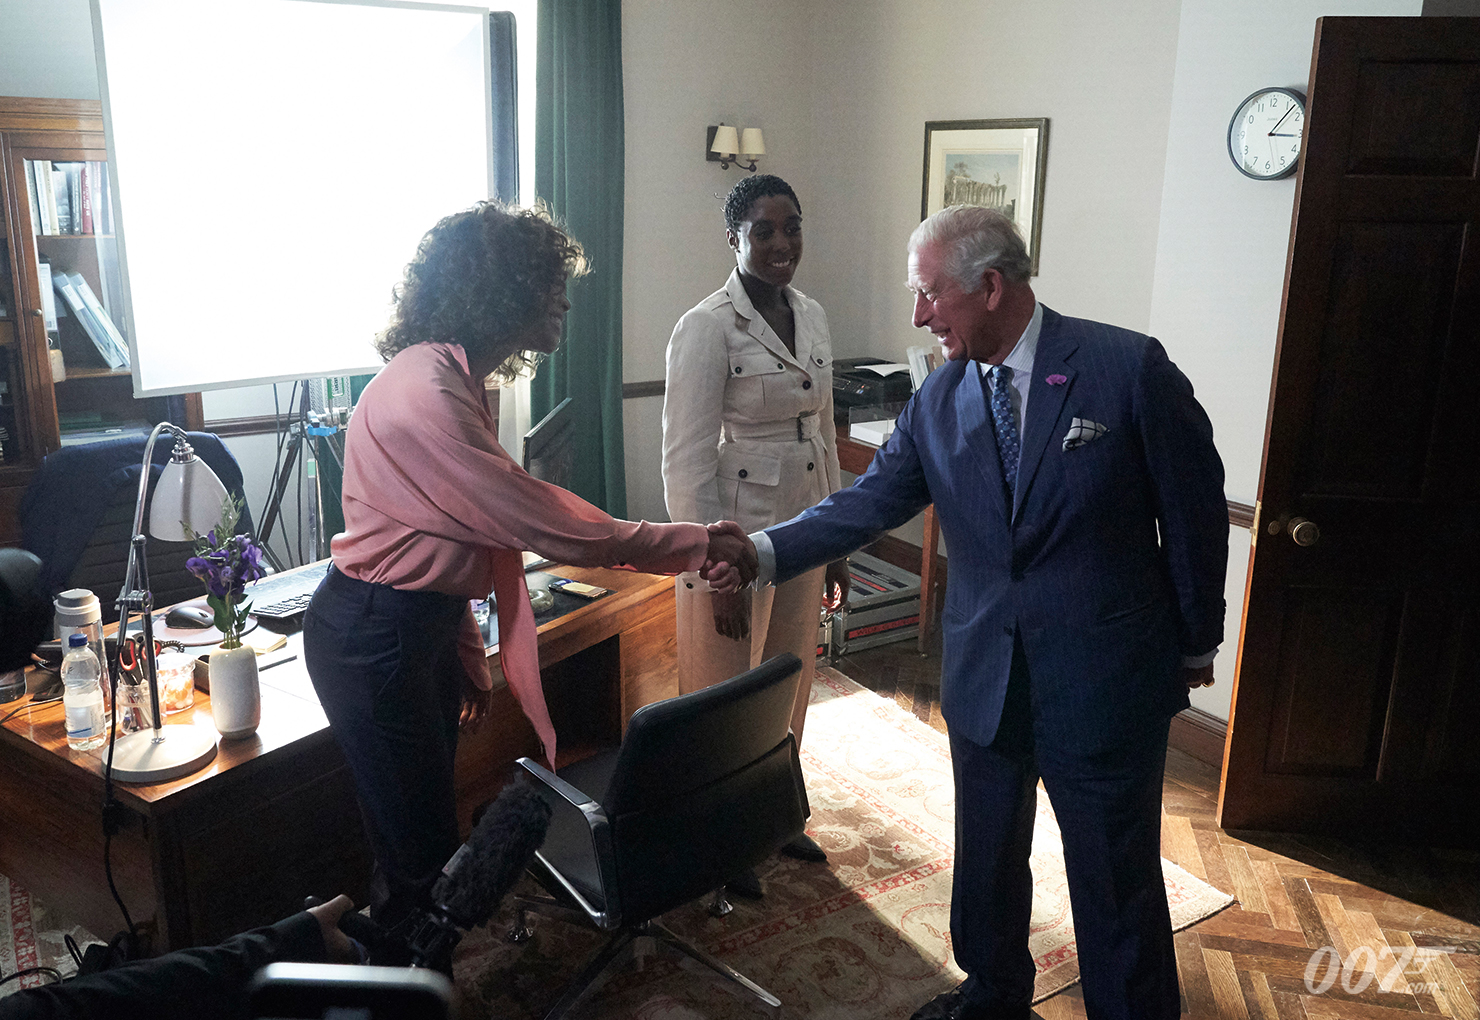 Prinz Charles mit Naomie Harris und Lashana Lynch in Moneypenny's Büro (c) 007.com